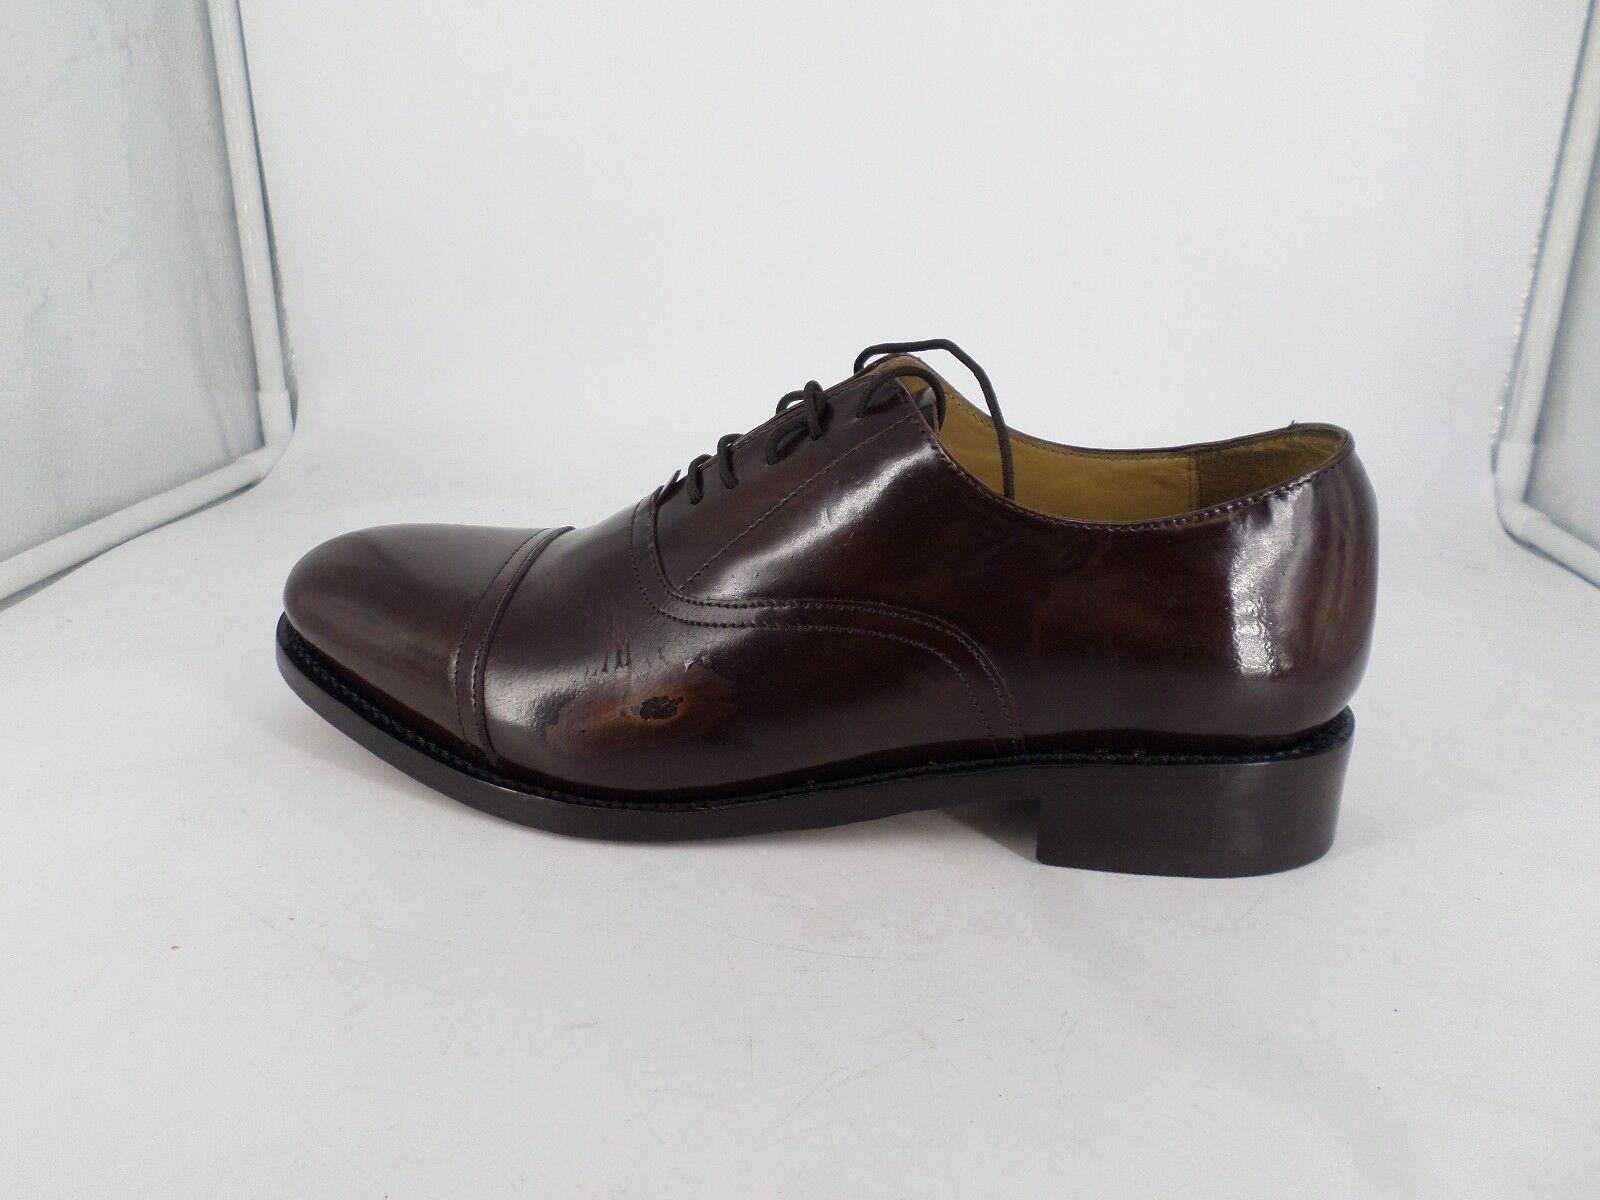 Samuel Windsor Oxford Mens Burgundy Classic Oxford Windsor Shoes LG06 27 1938f7